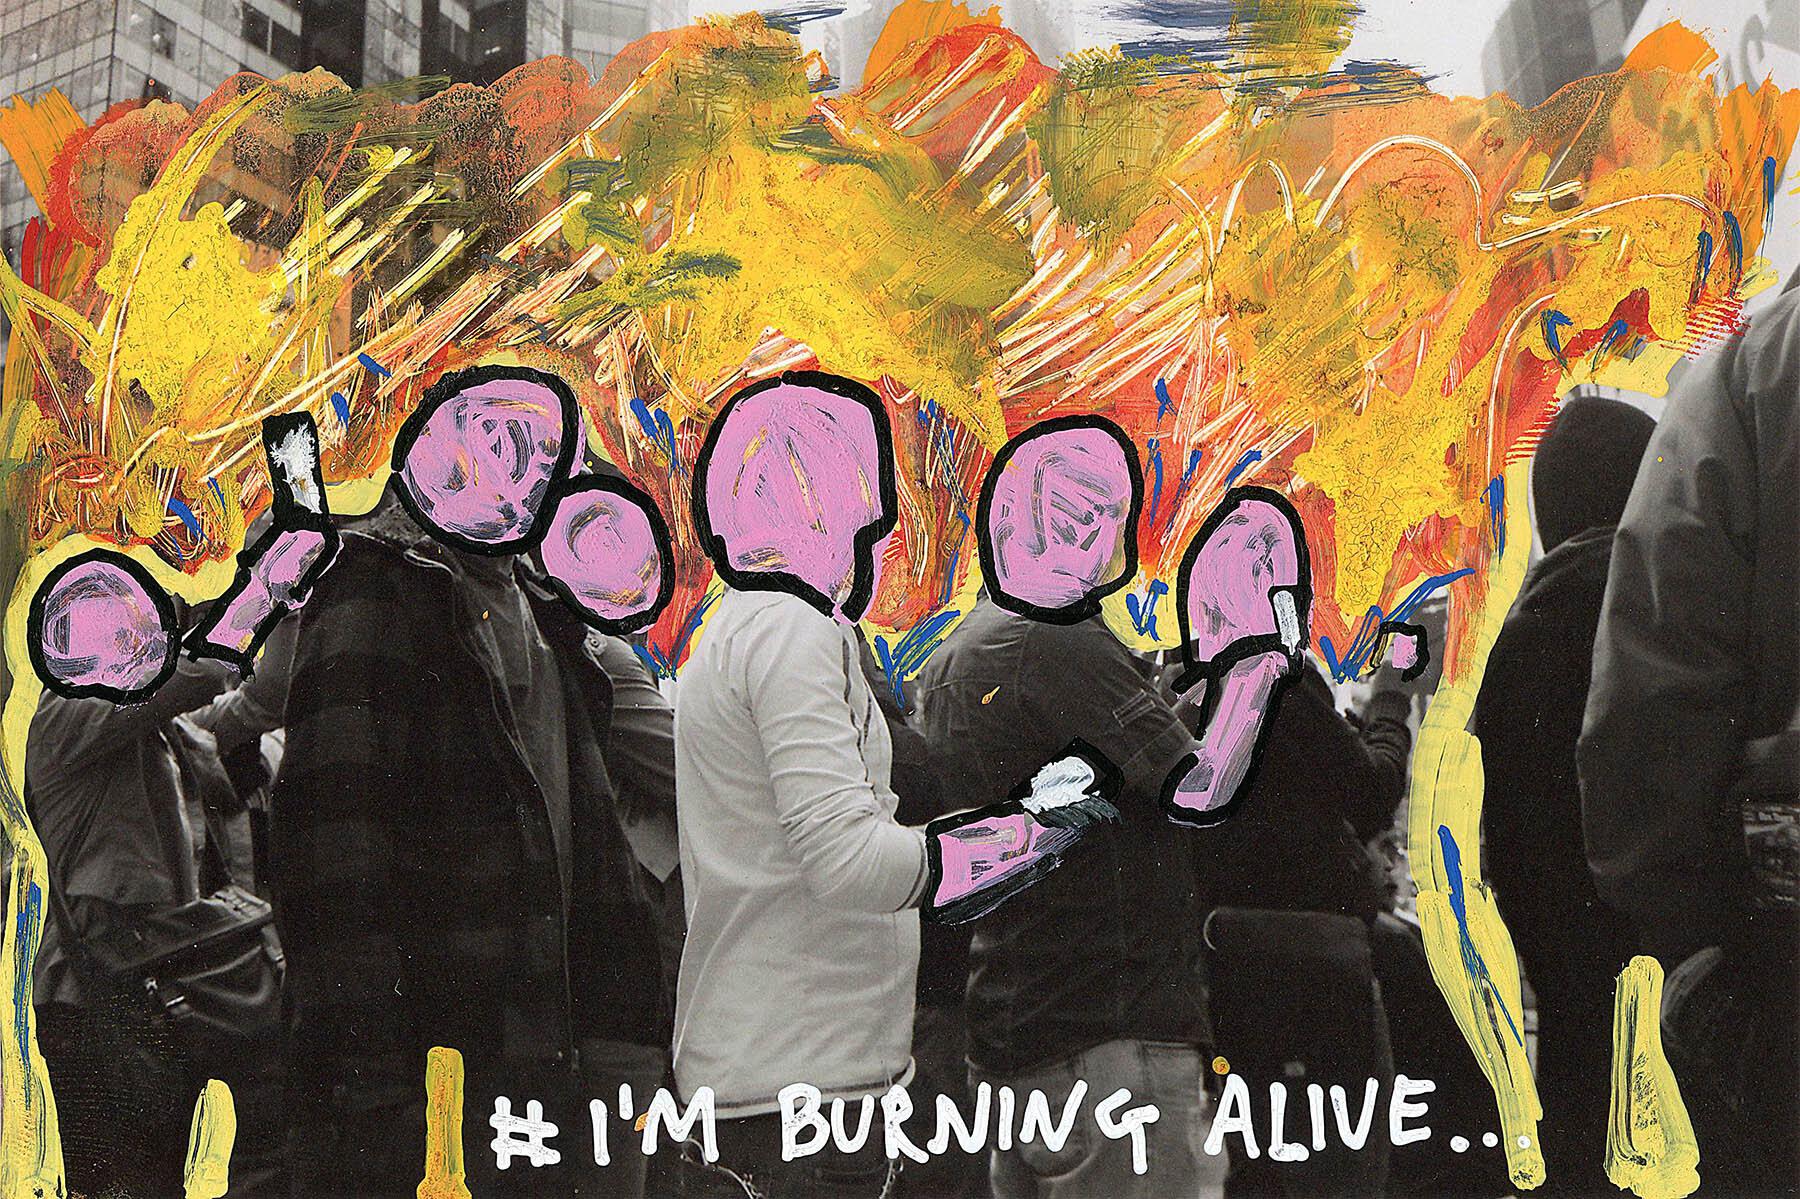 'I'm Burning Alive' 2015, Berlin, Inkjet photograph & Acrylic, 10x15cm